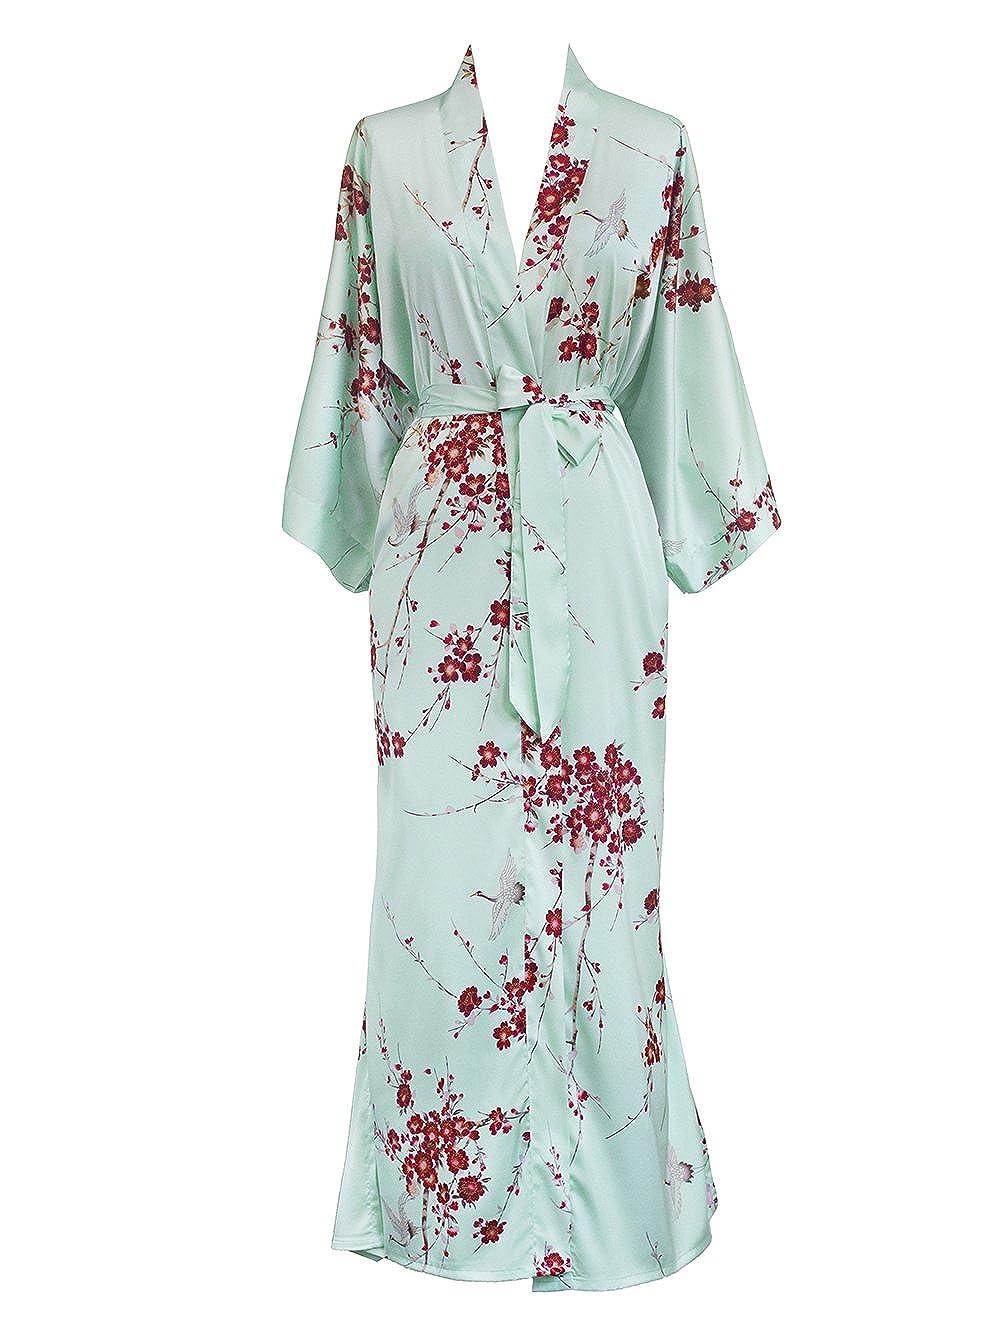 Cherry Blossom & Crane Aqua Old Shanghai Women's Kimono Robe Long  Watercolor Floral